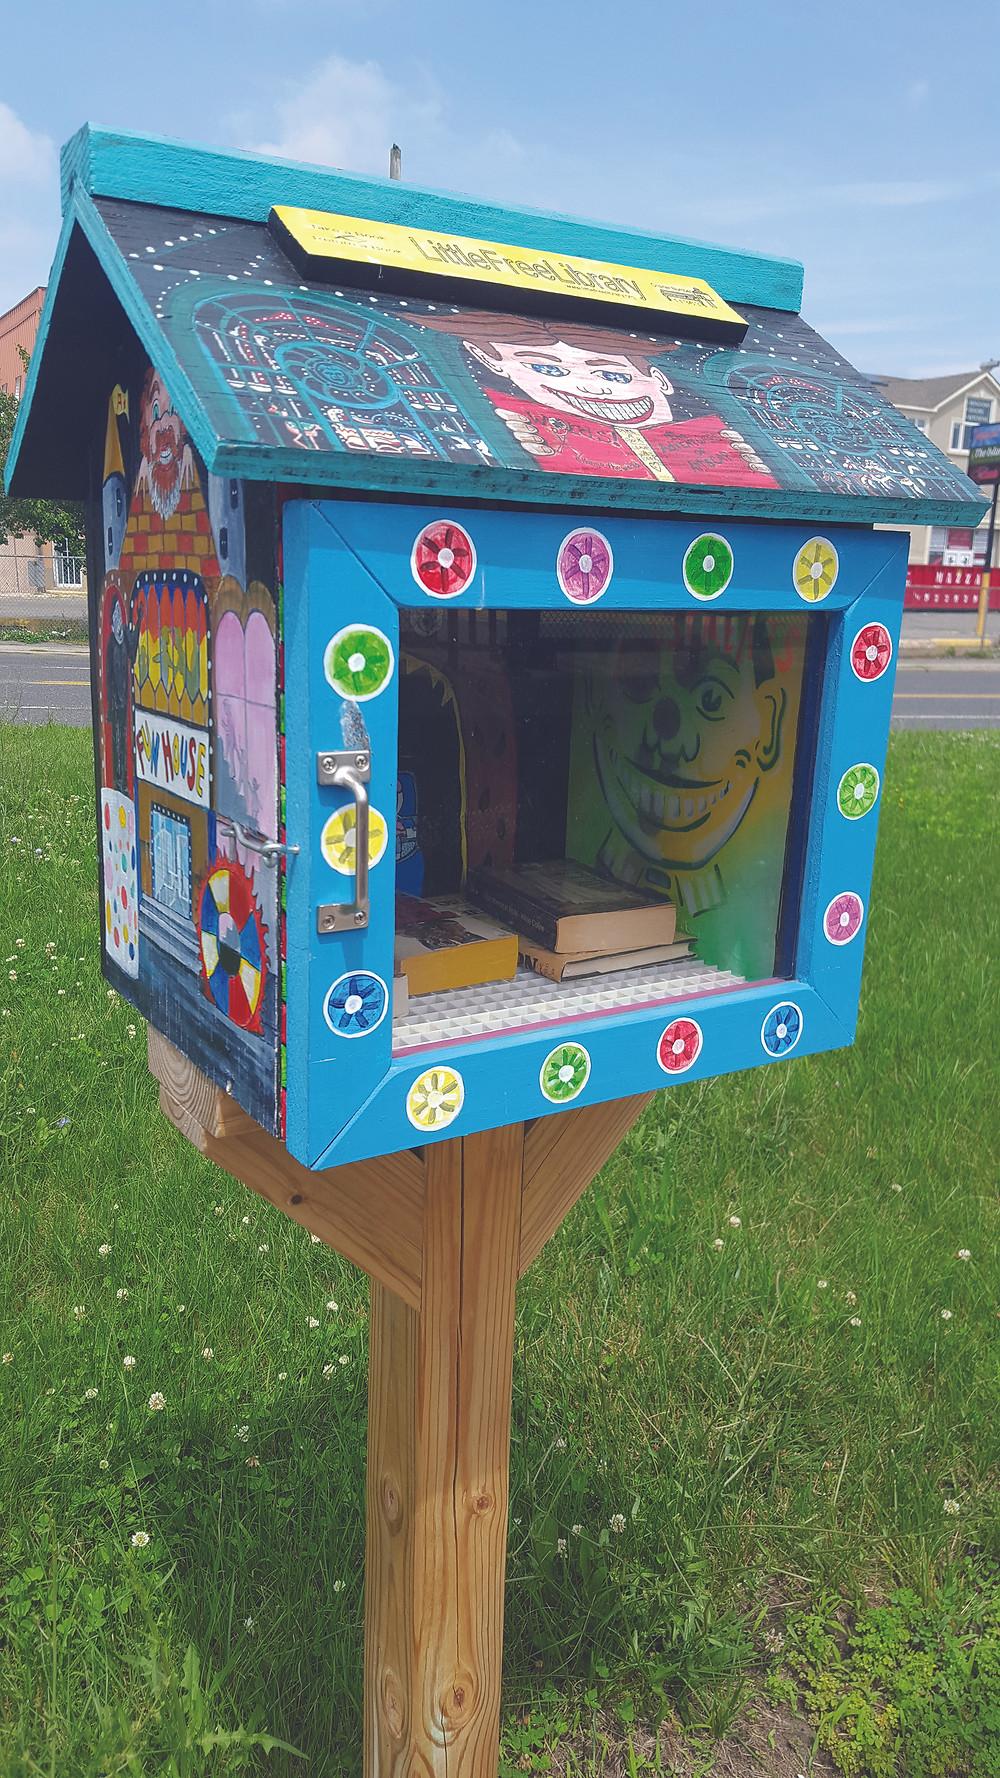 Asbury Park Mini Library  Photo by Vanessa M. Arico, Asbury Park Zest